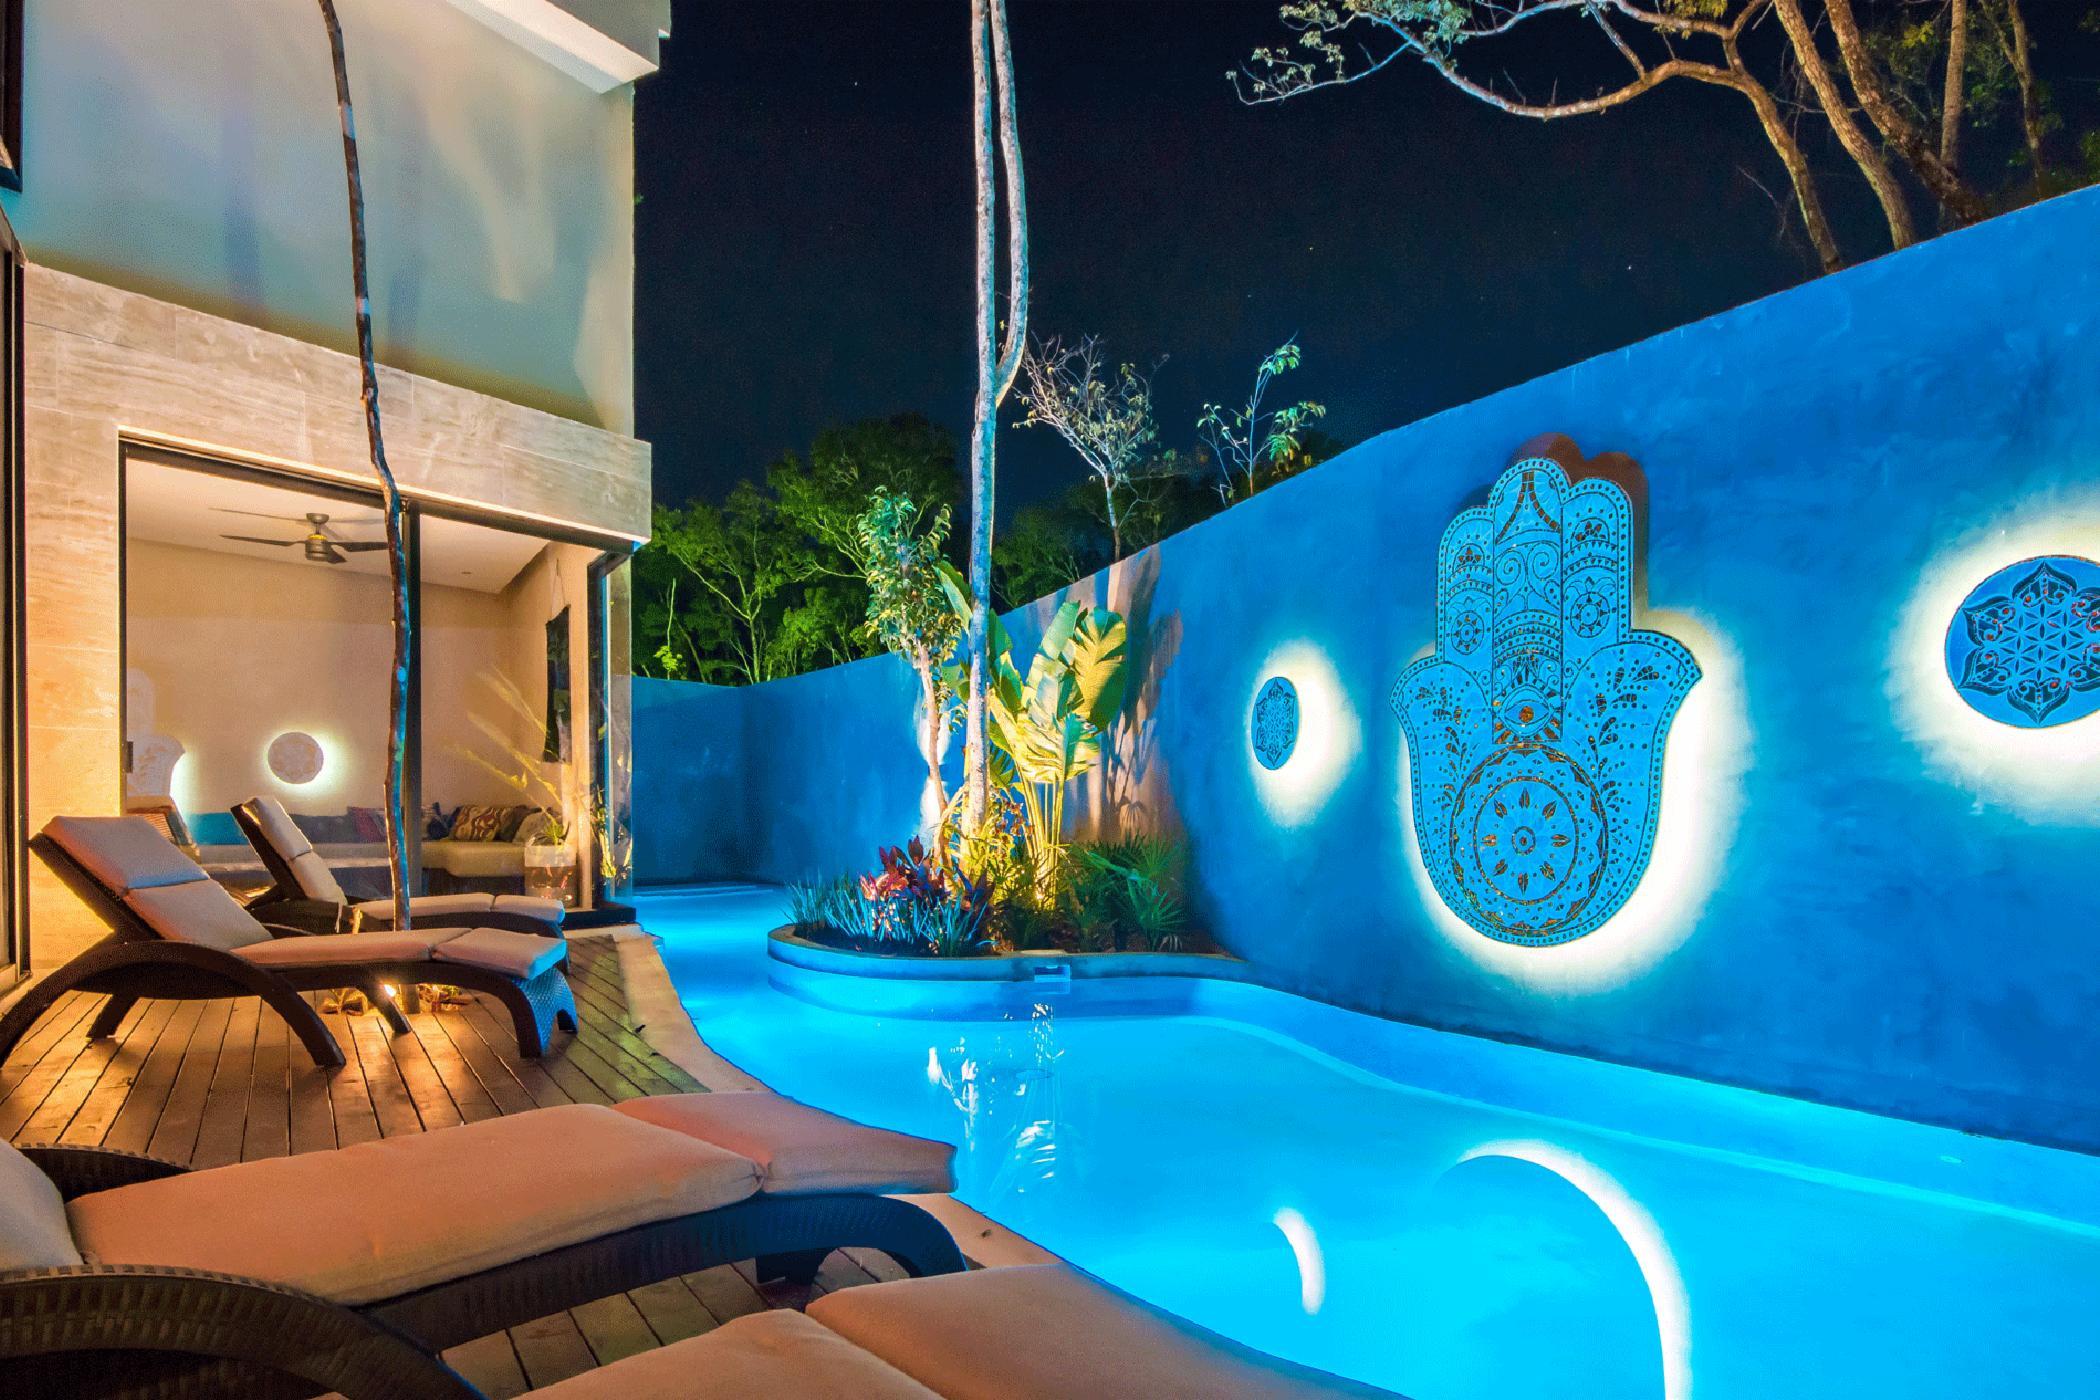 Luxury 6000+ sq.ft. 5 BDR Tulum villa; grand architecture, theatre room, private pools, indoor/outdoor Zen living